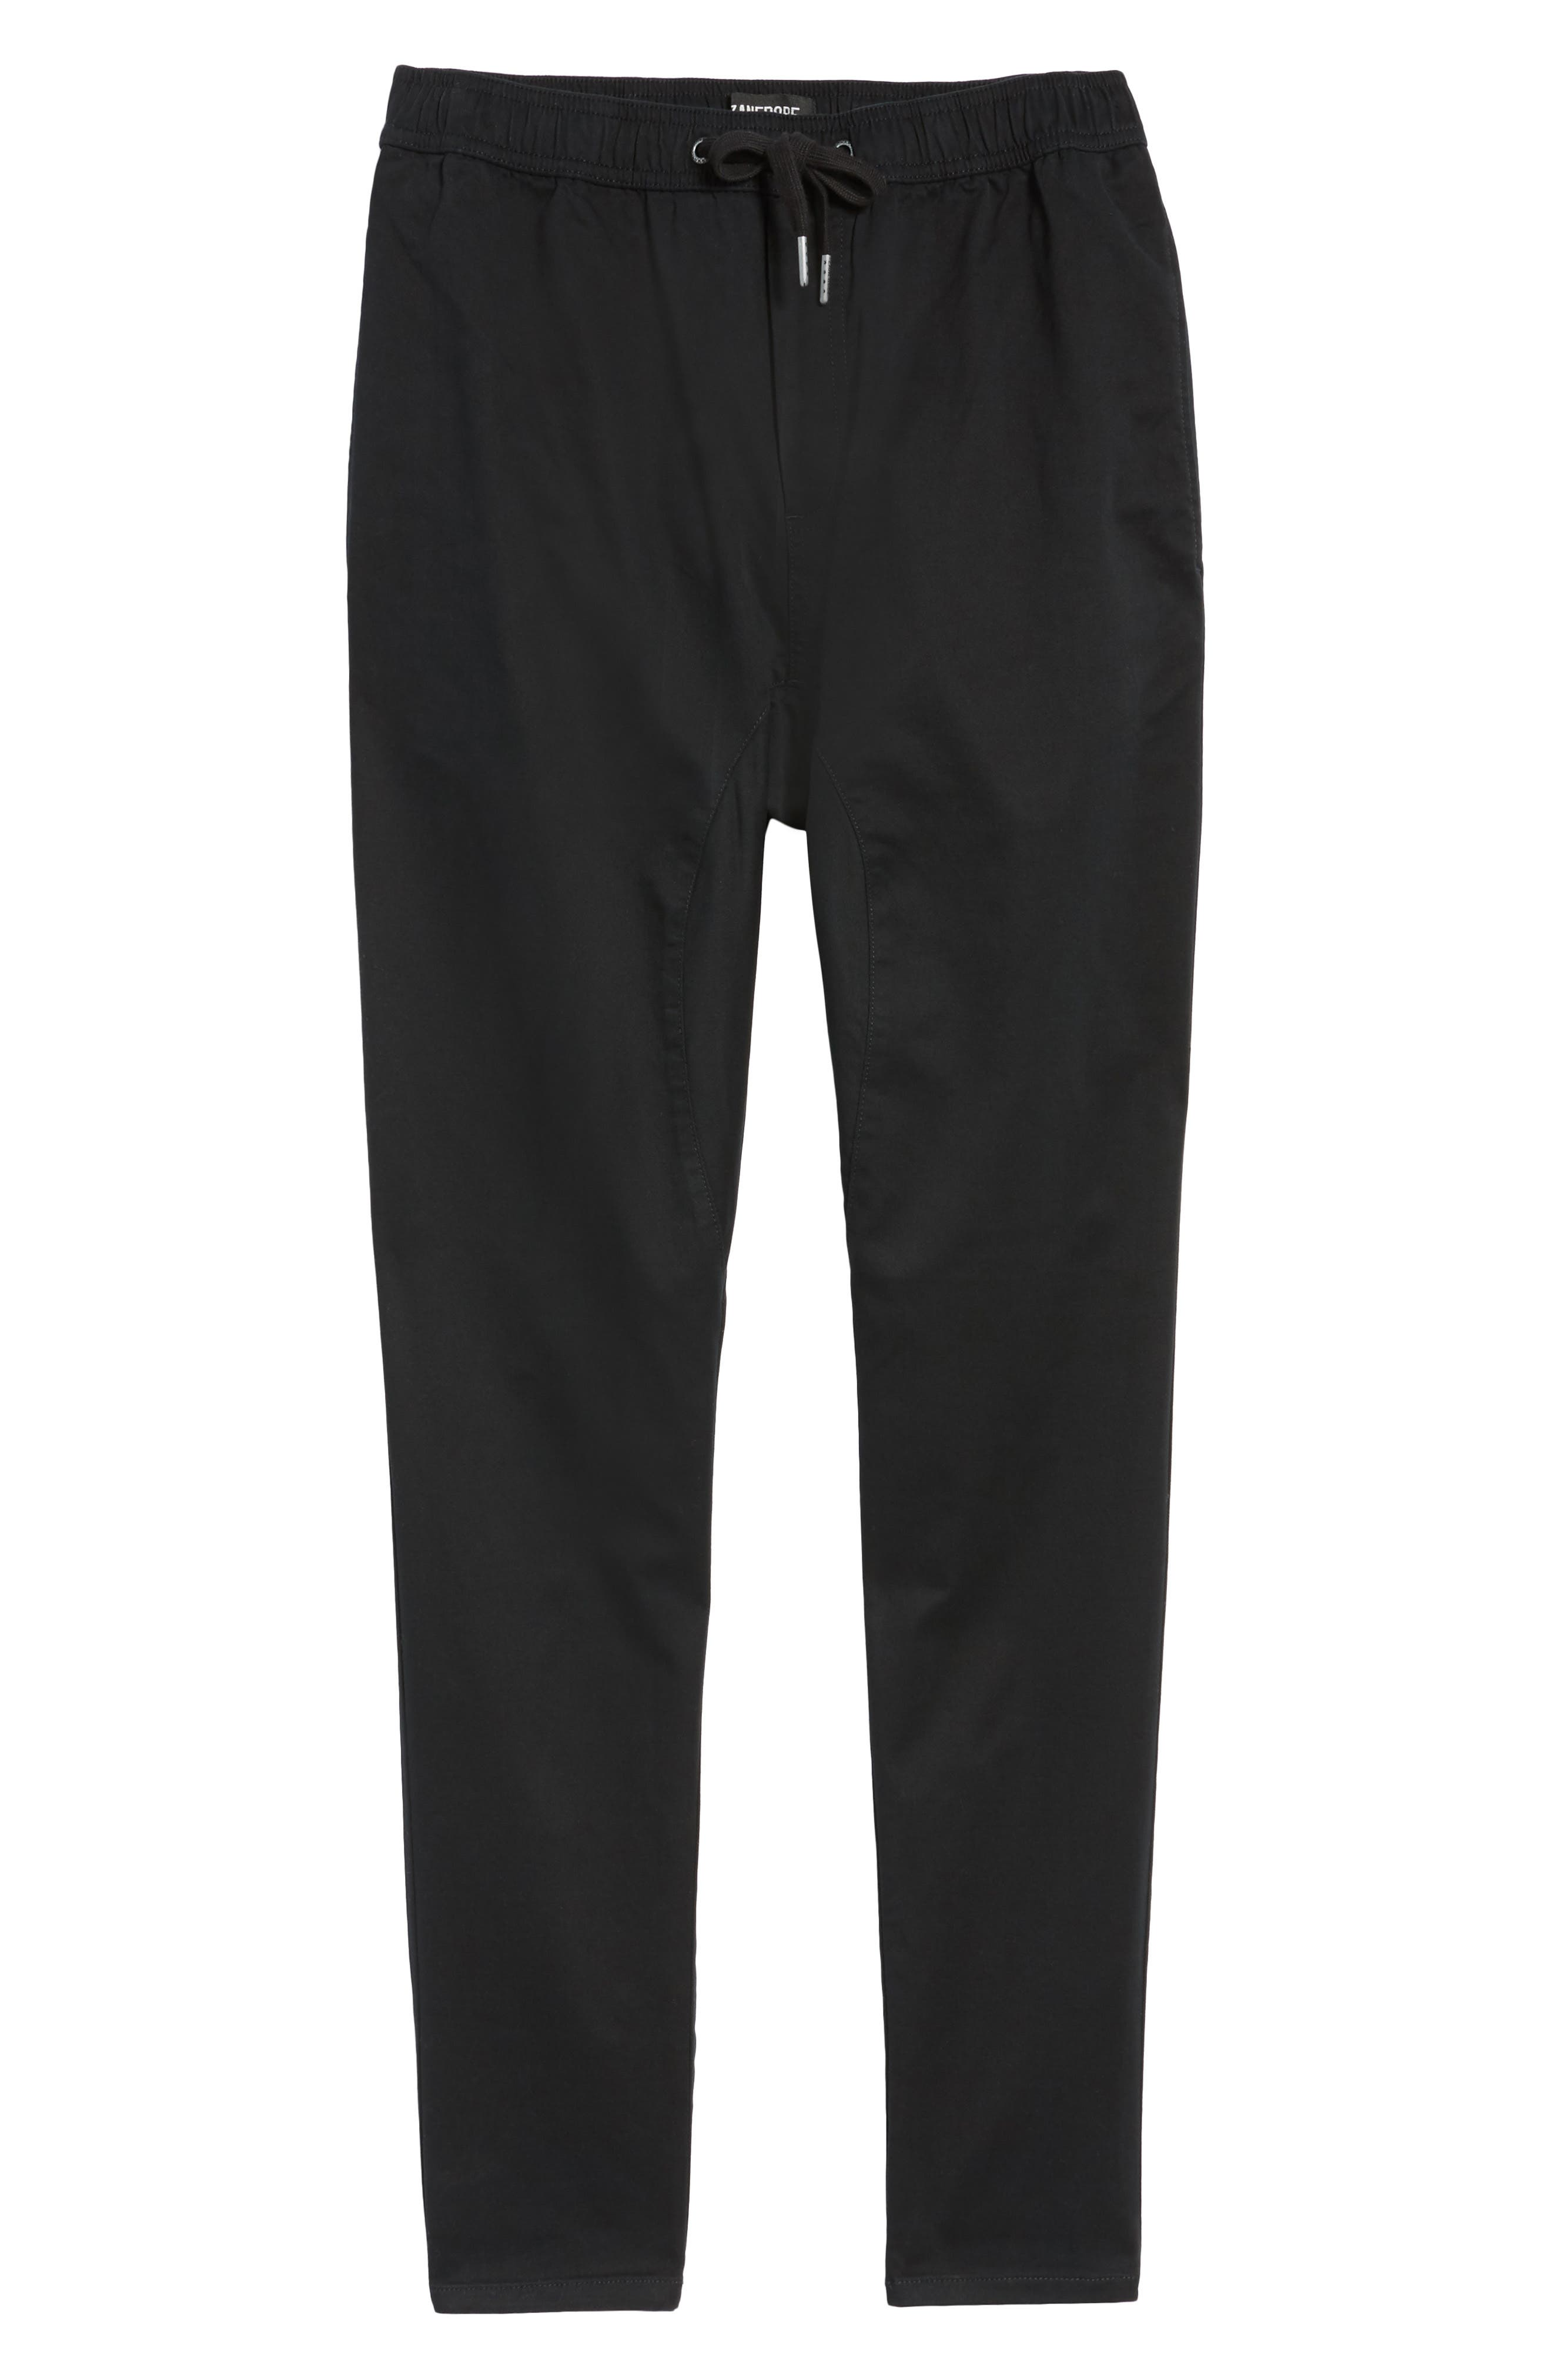 Salerno Stretch Woven Jogger Pants,                         Main,                         color, BLACK